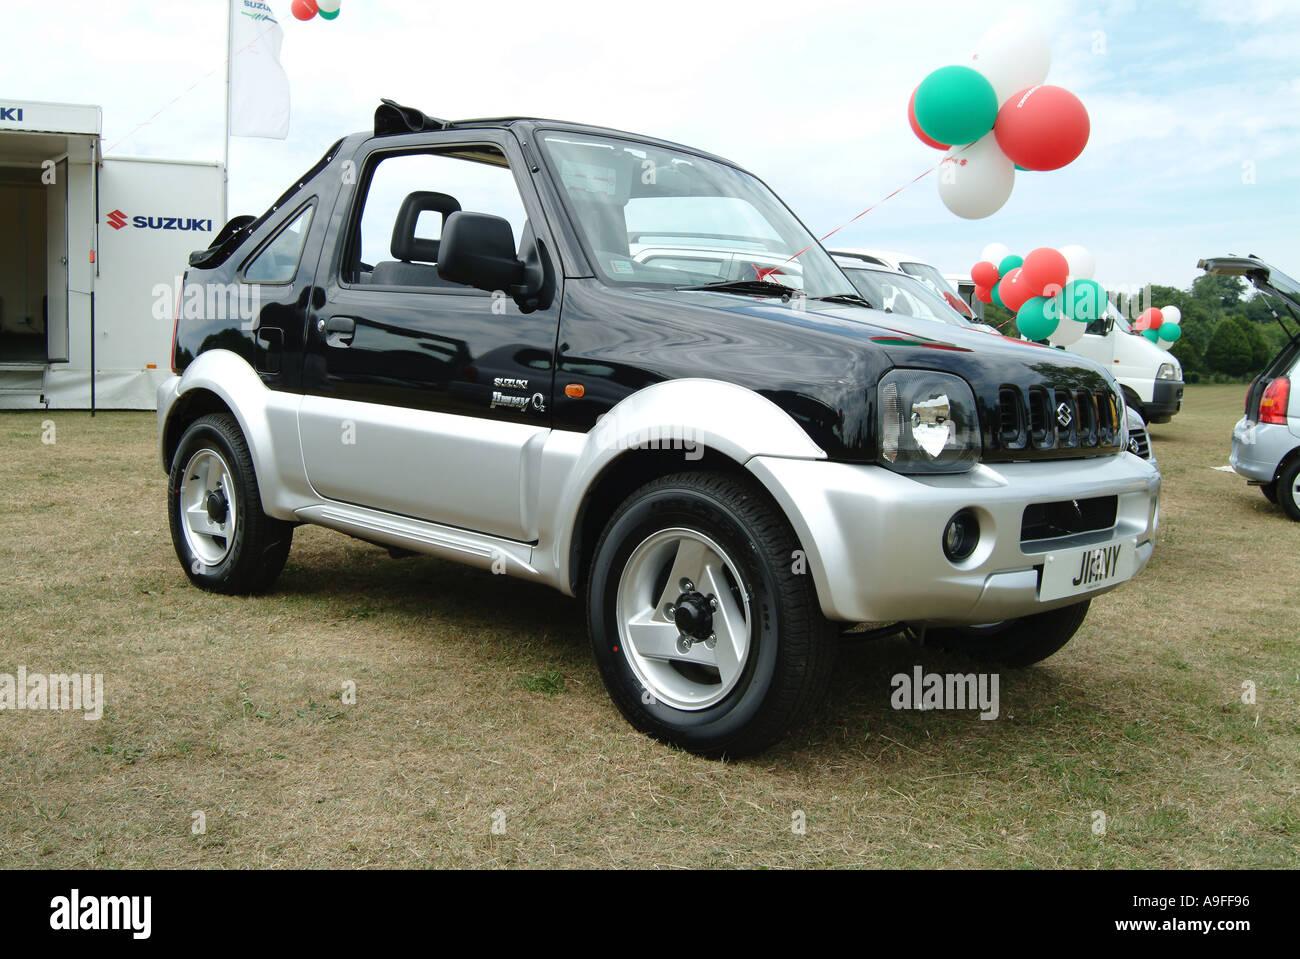 suzuki l japan japanese jimmy 4 4 jeep New car Finance dealer show ...